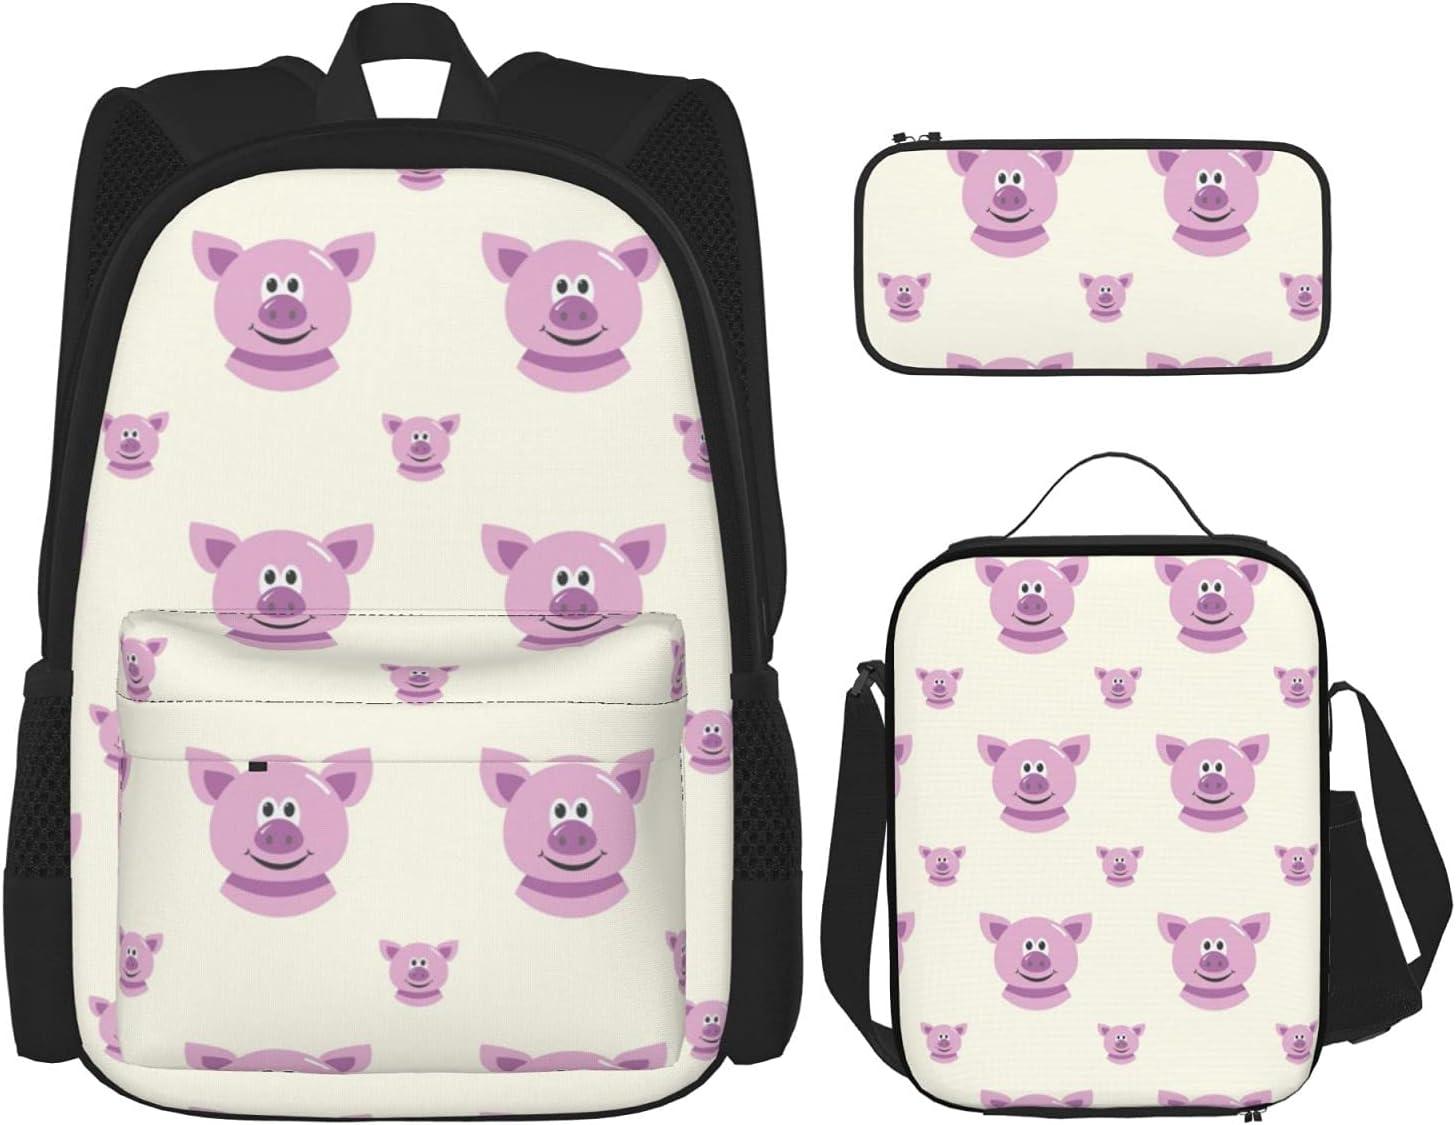 Pig New sales Cheap SALE Start Pattern FashionDurable Backpack Set Bac Child 3-Piece Travel